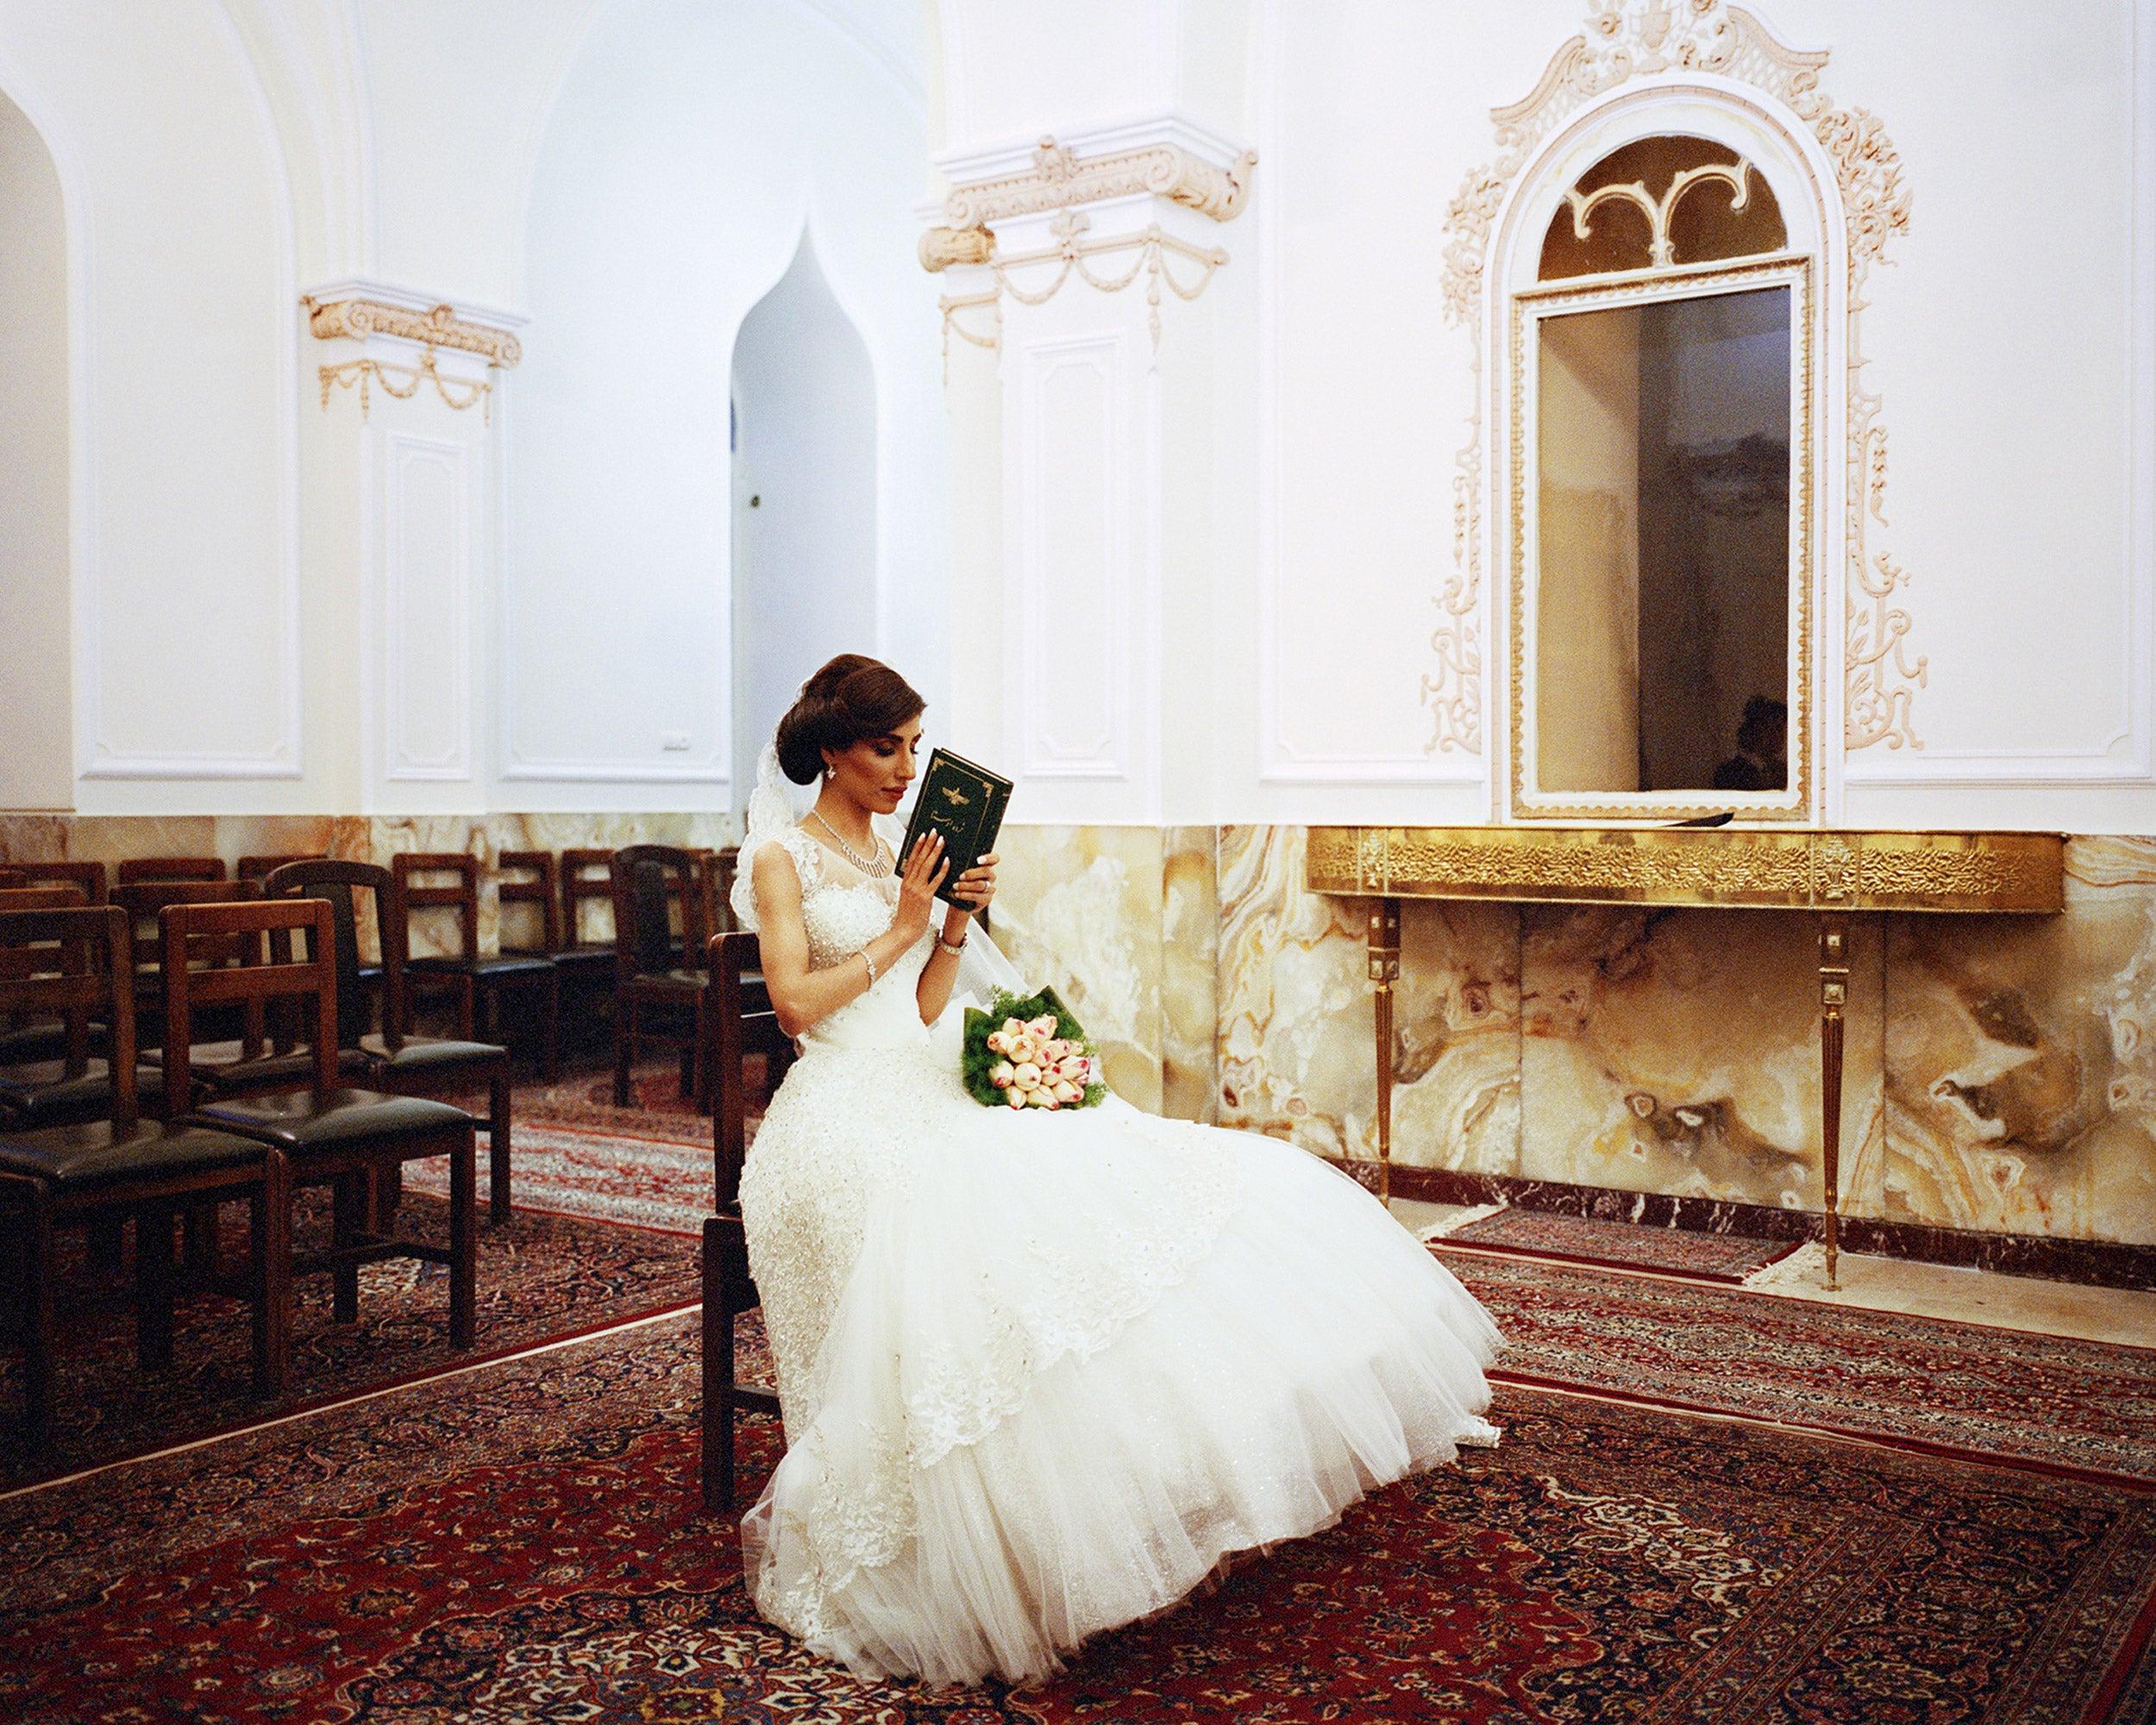 Zoroastrian bride.